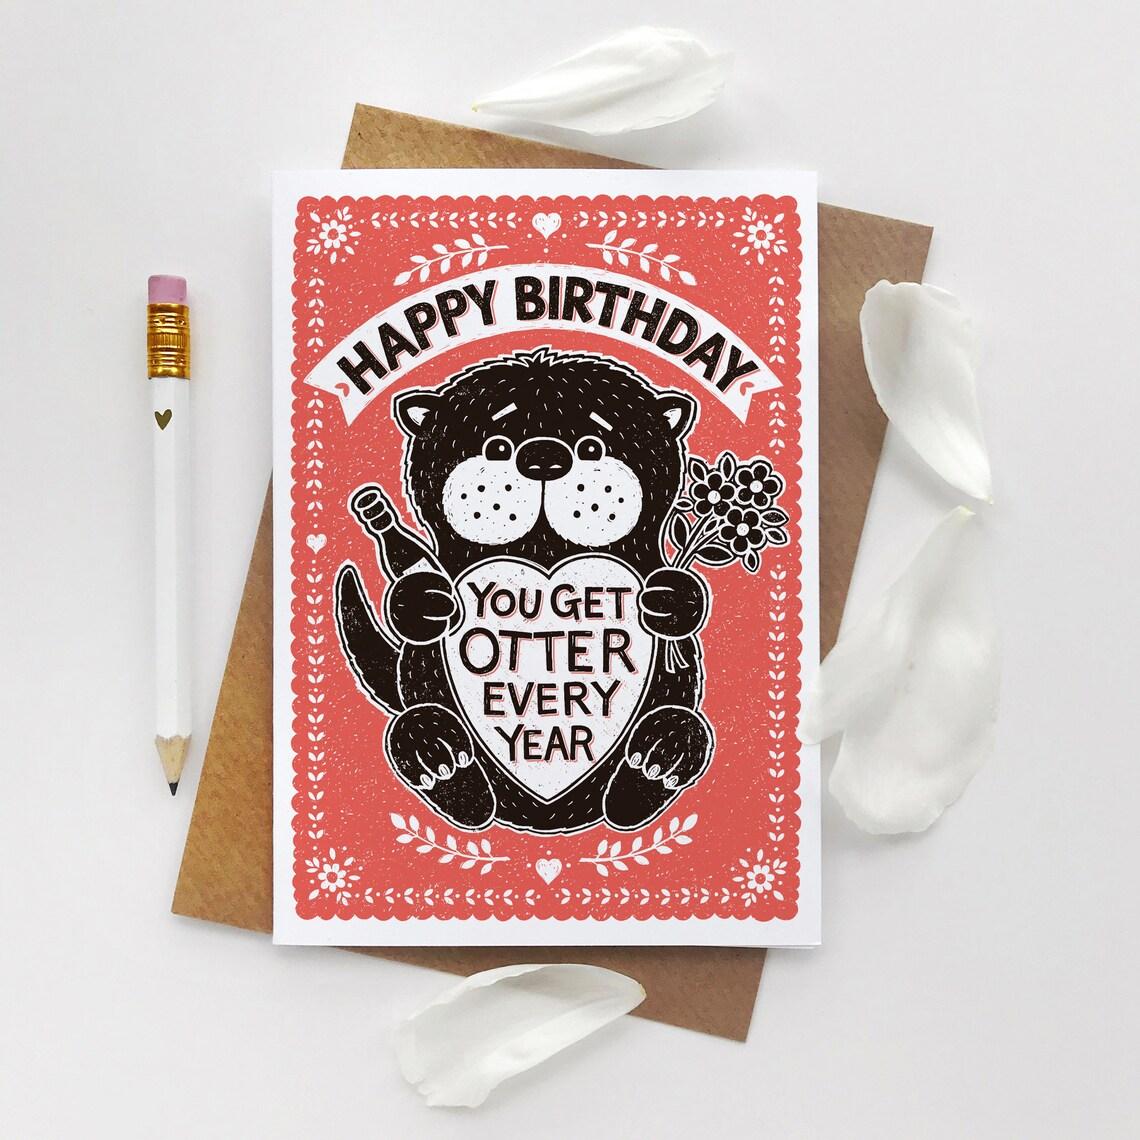 Alexandra Snowdon Otter Birthday Card